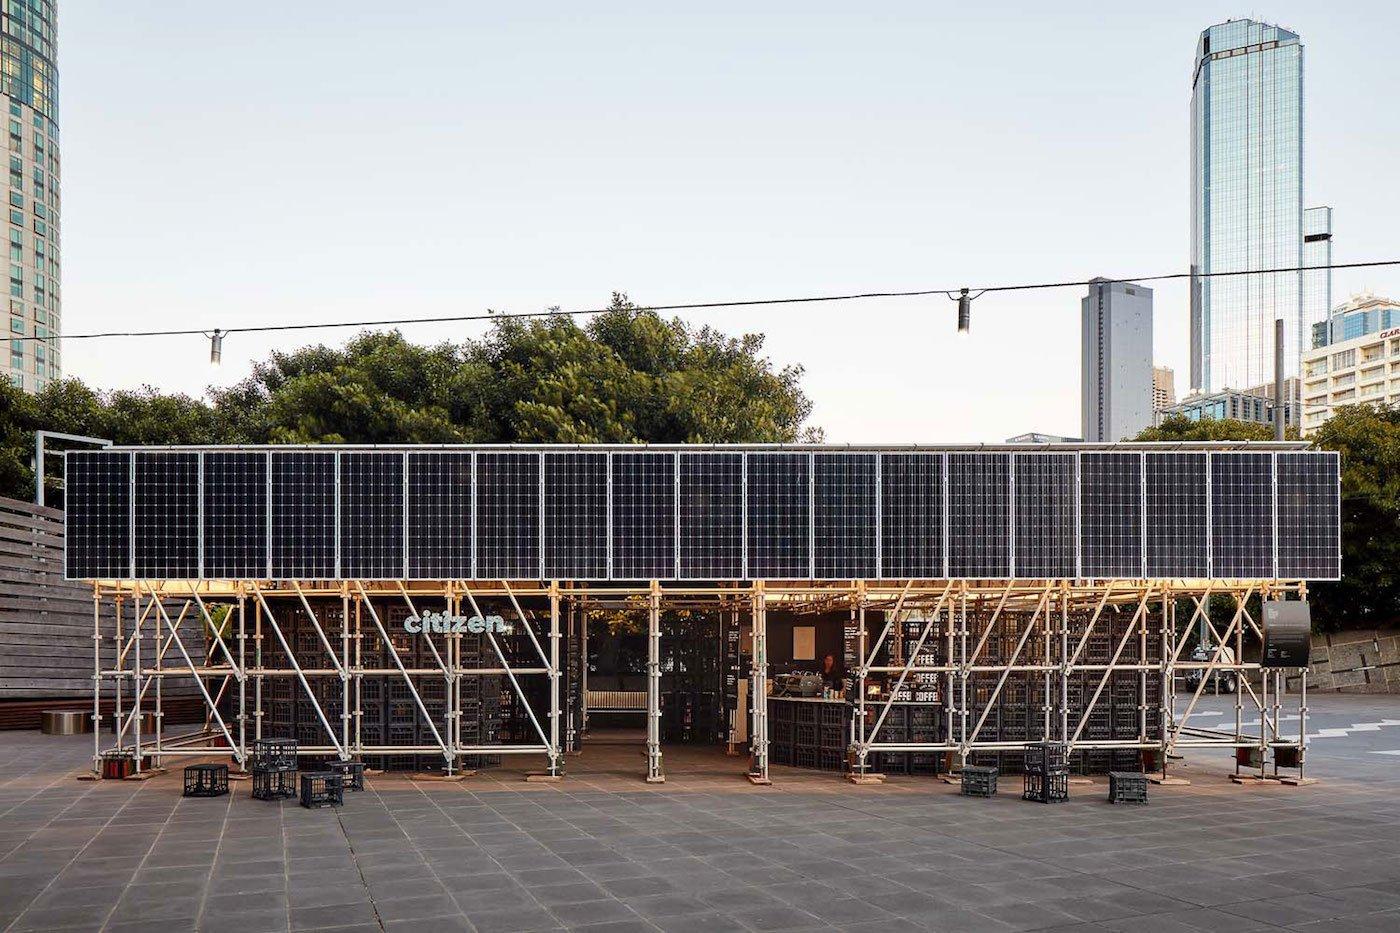 External view of solar panels on facade